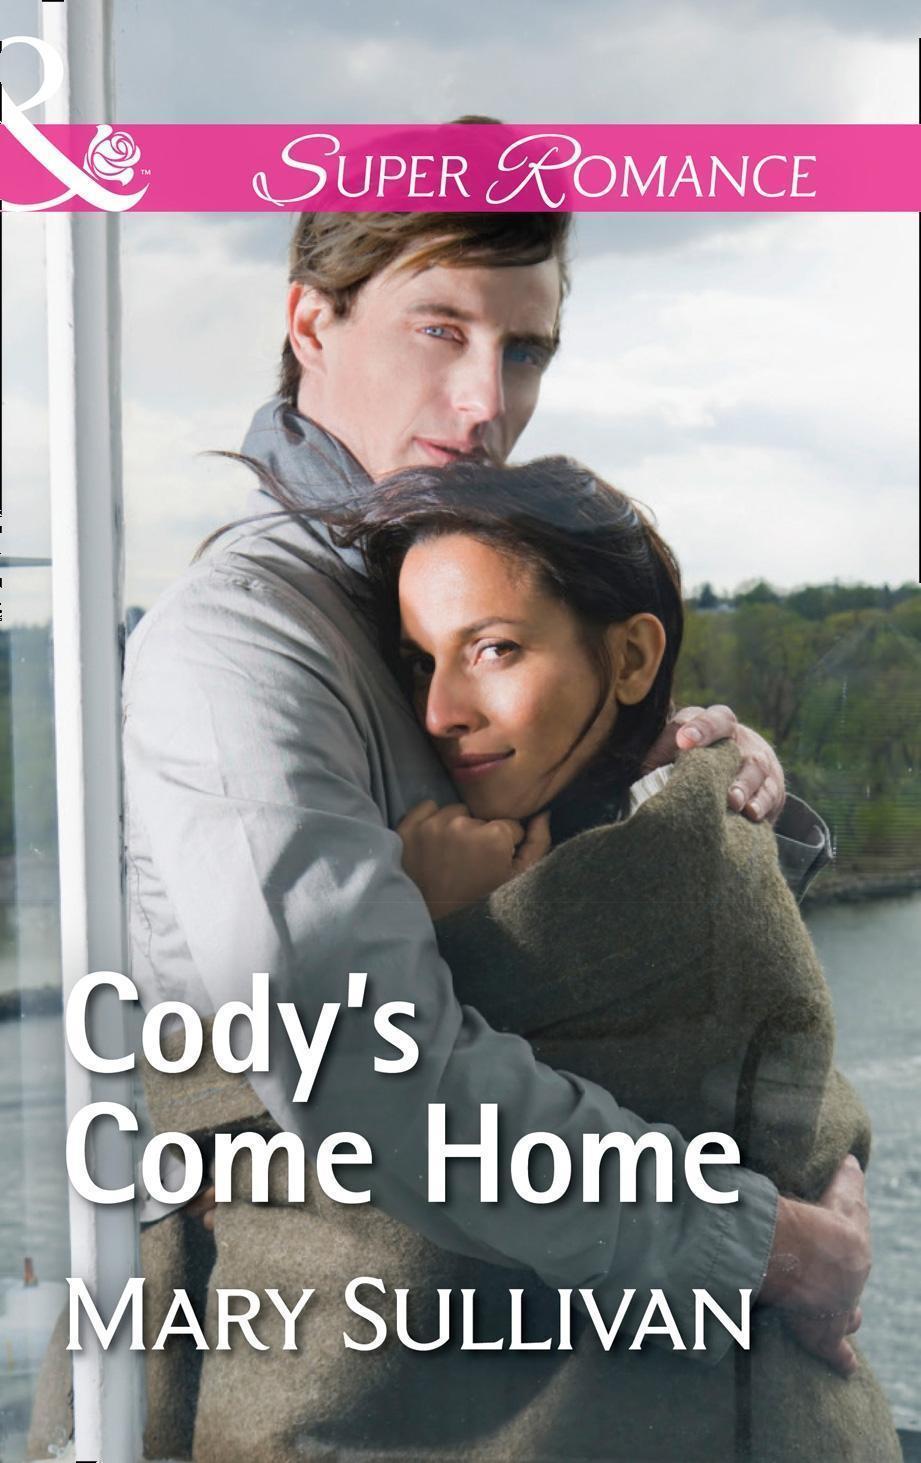 Cody's Come Home (Mills & Boon Superromance)